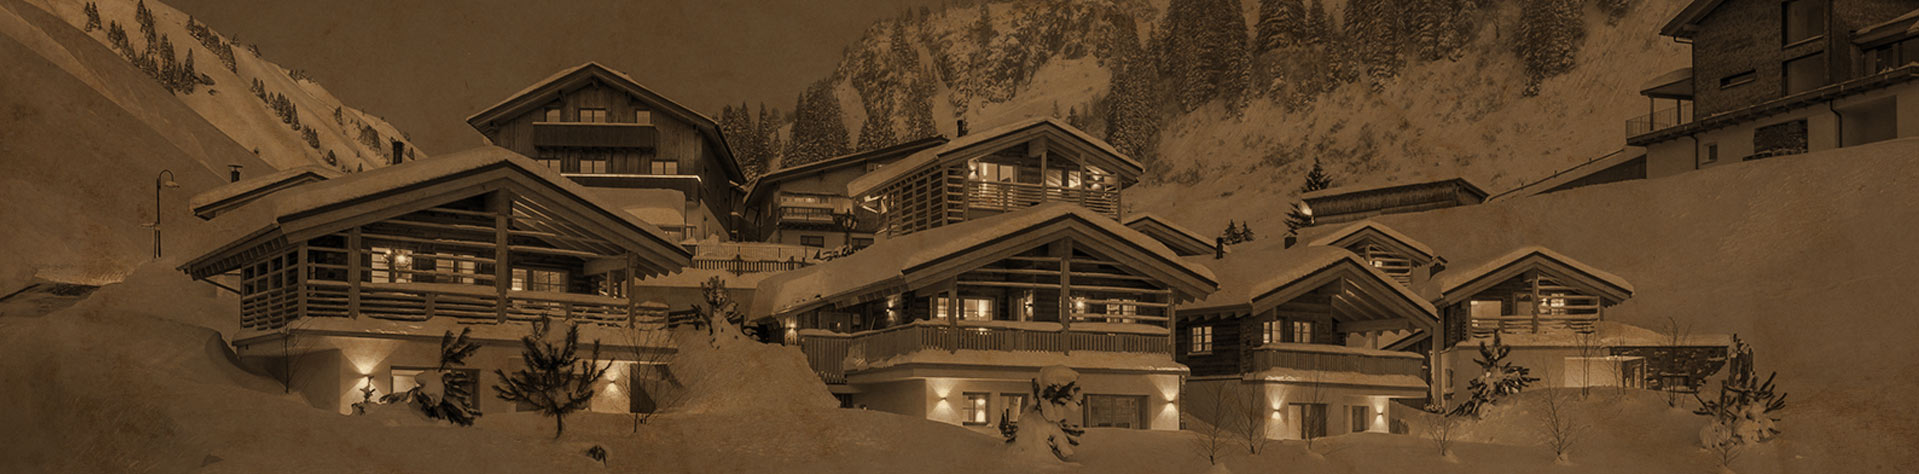 chalets-arlberg